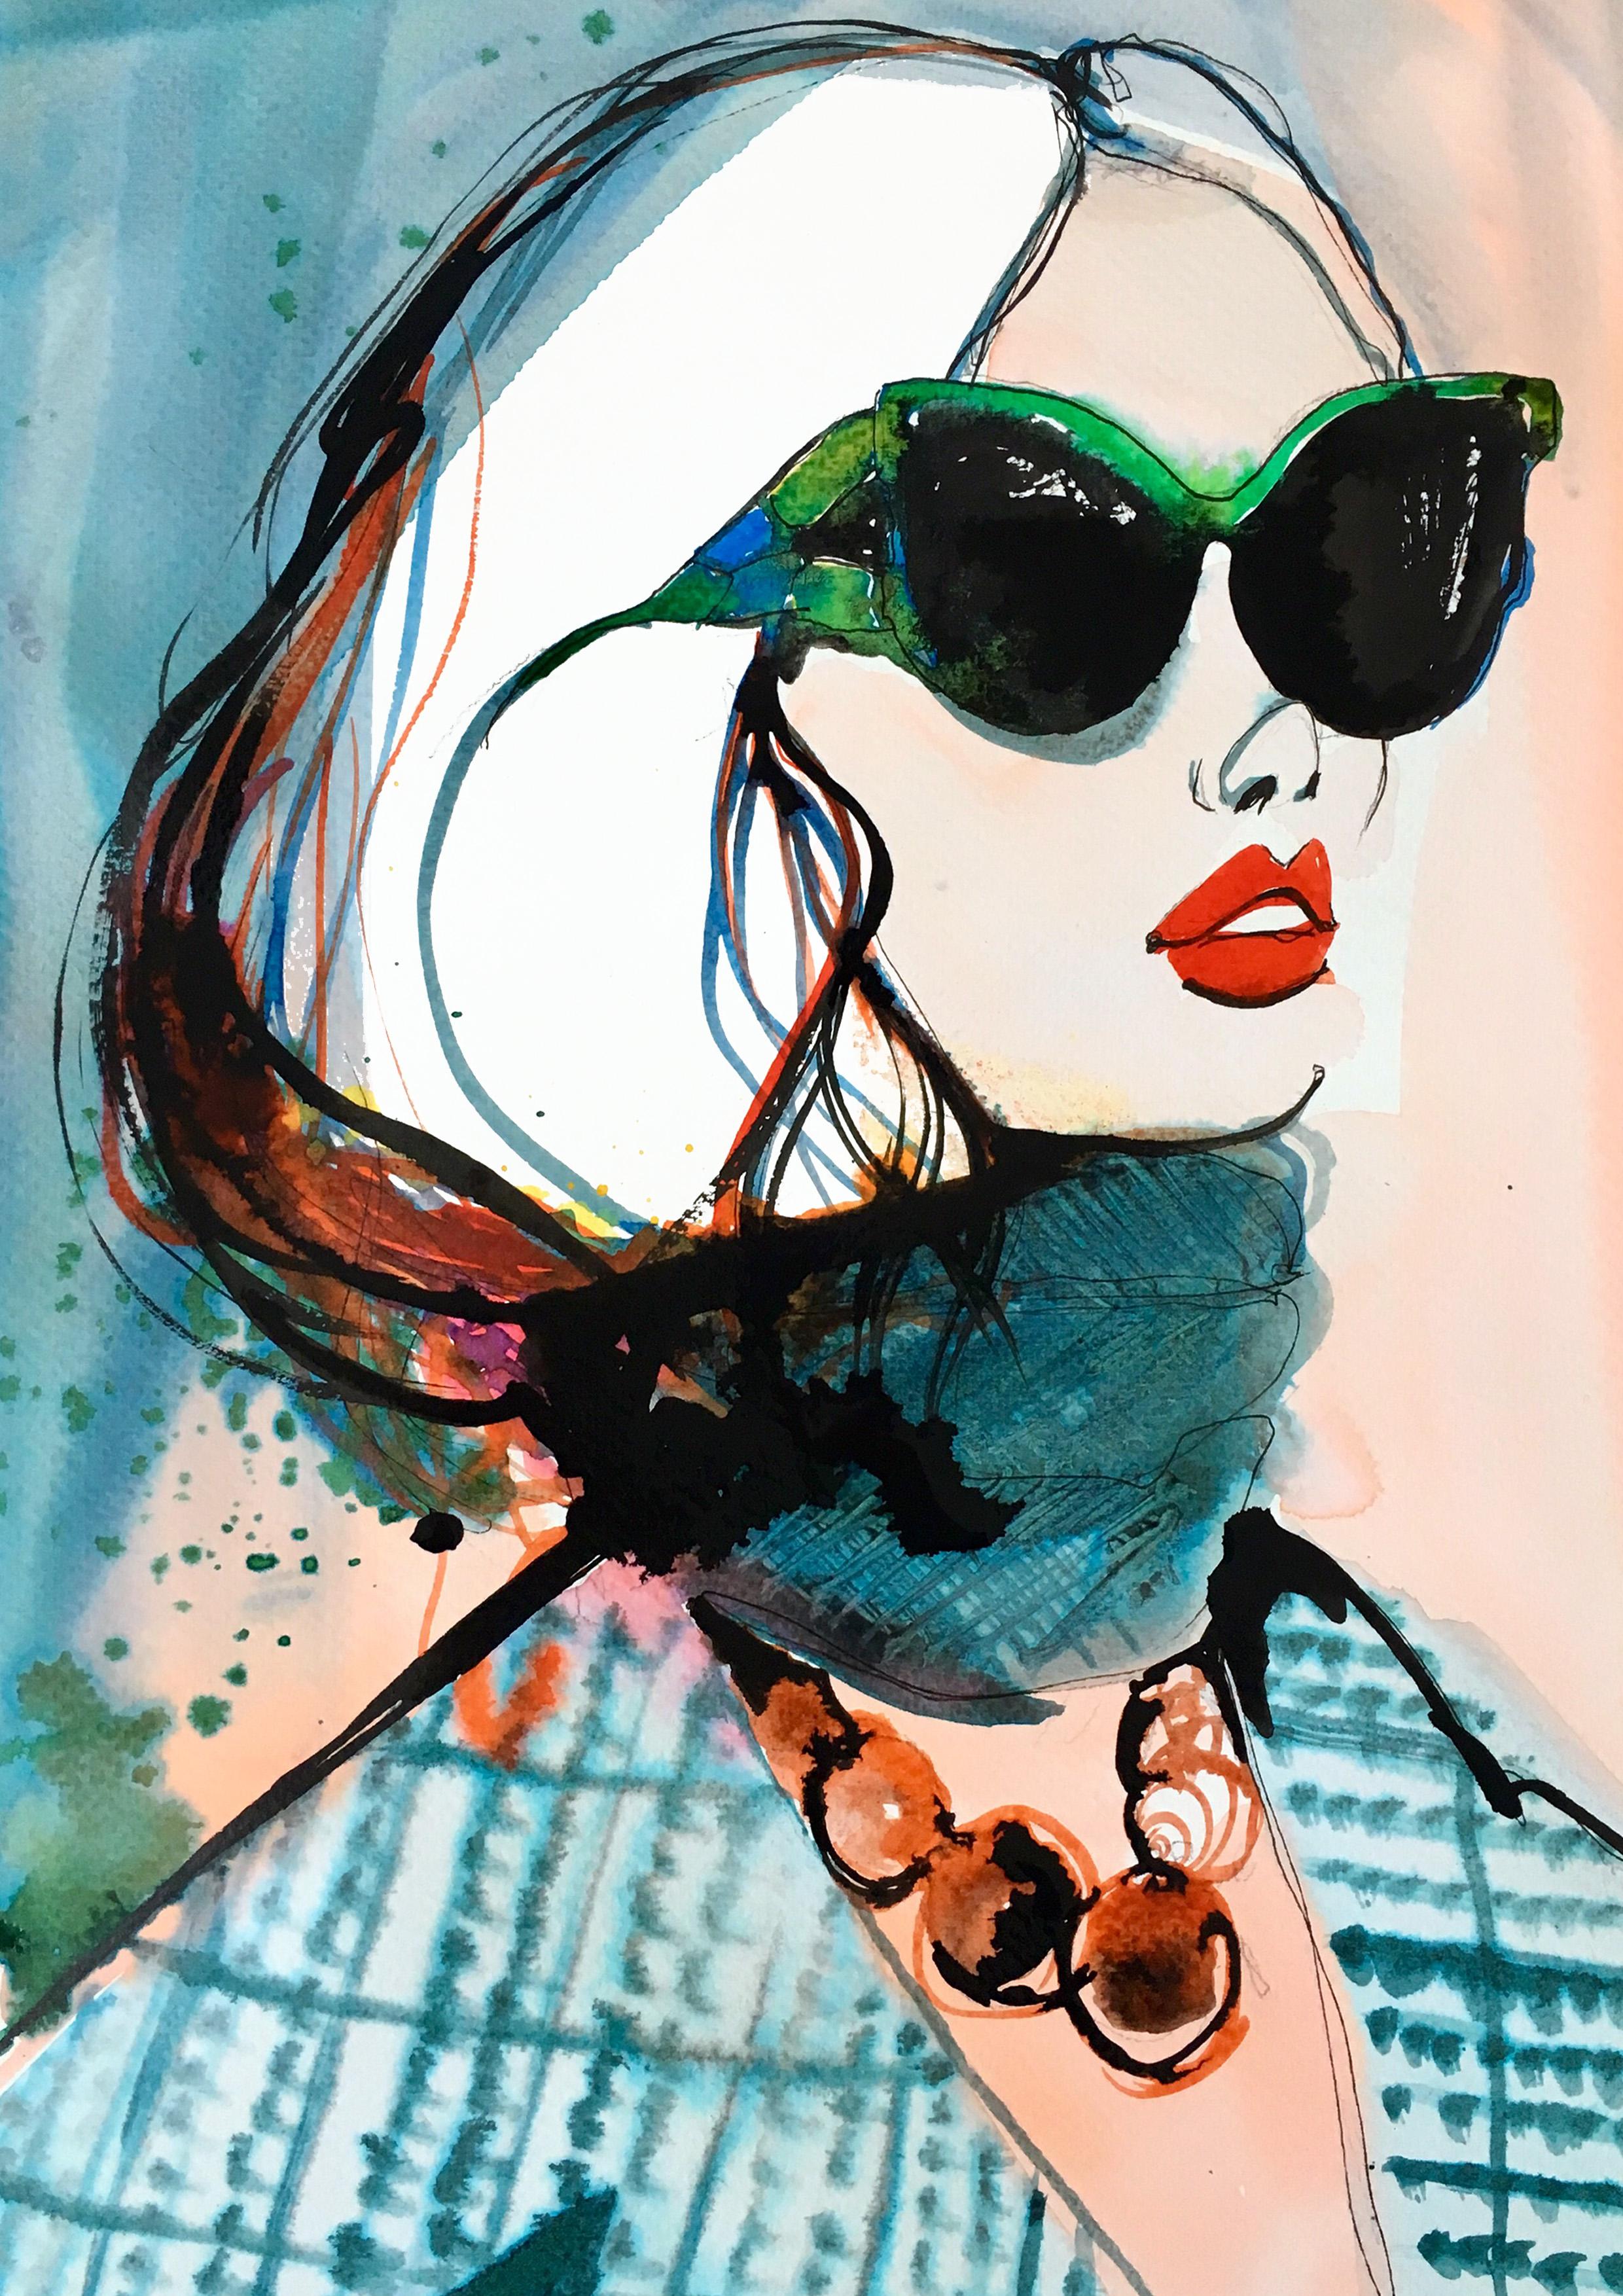 Prada - Ink illustration on paperA3 (29.7x42cm)£400